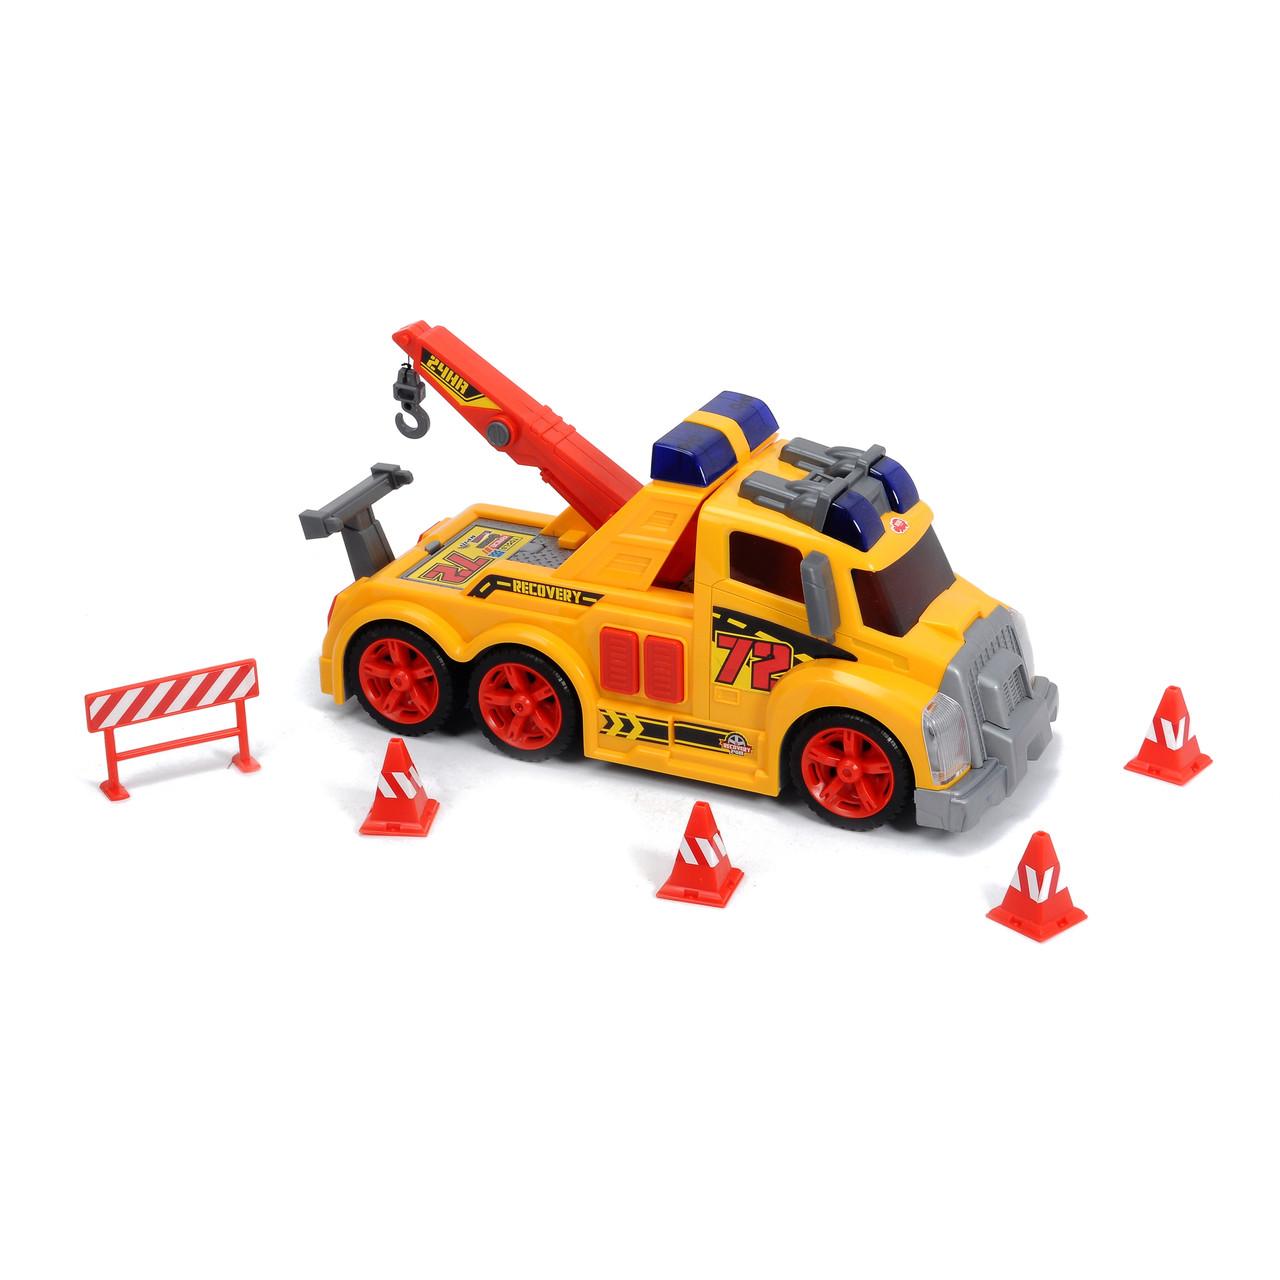 "Эвакуатор ""Tow Truck"", 33 см «Dickie Toys» (3308359)"